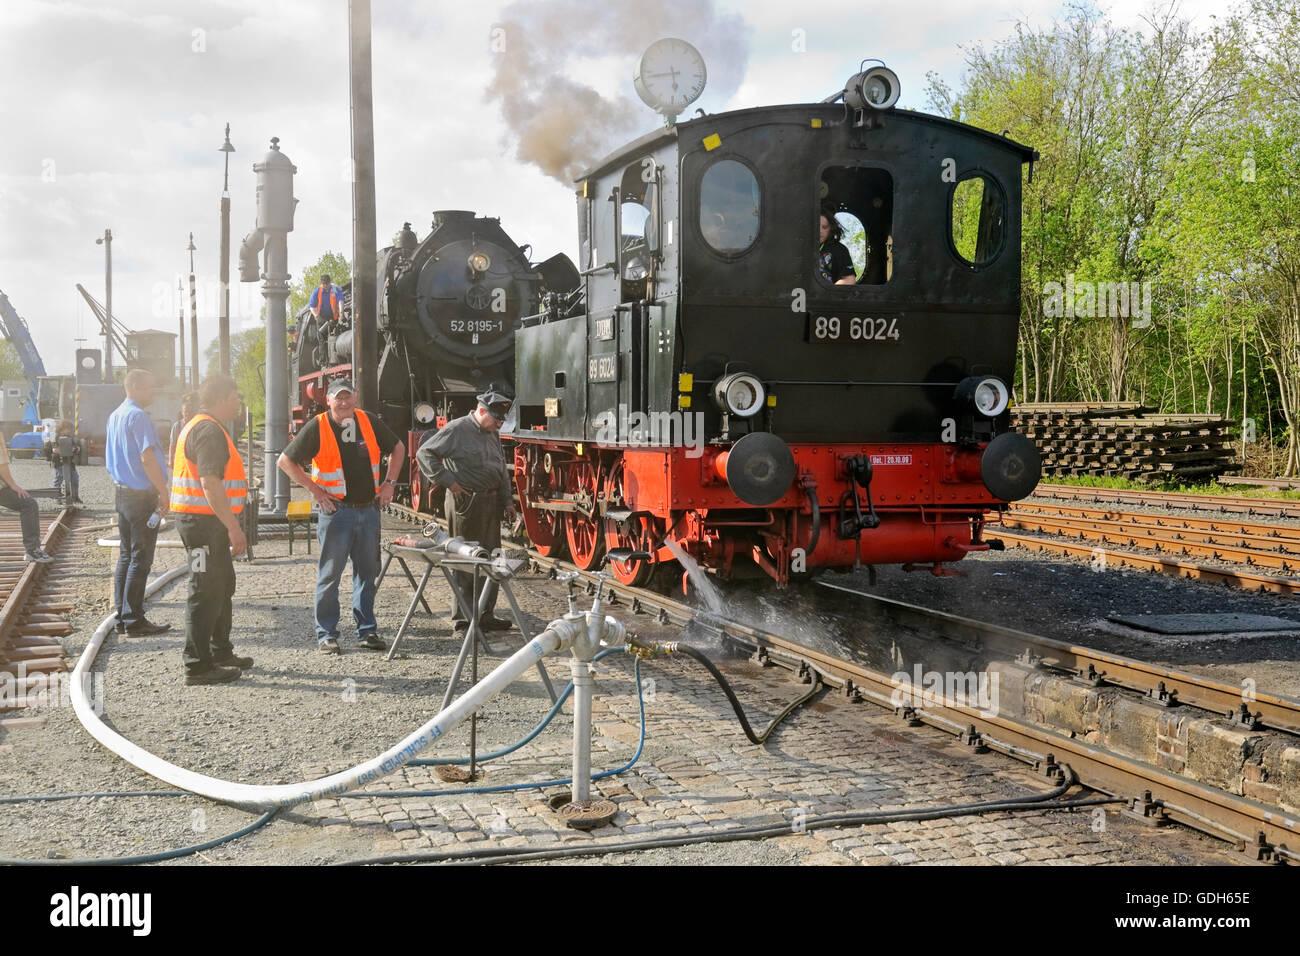 Steam locomotives at the German steam locomotive museum, Neuenmarkt, Franconia, Bavaria - Stock Image